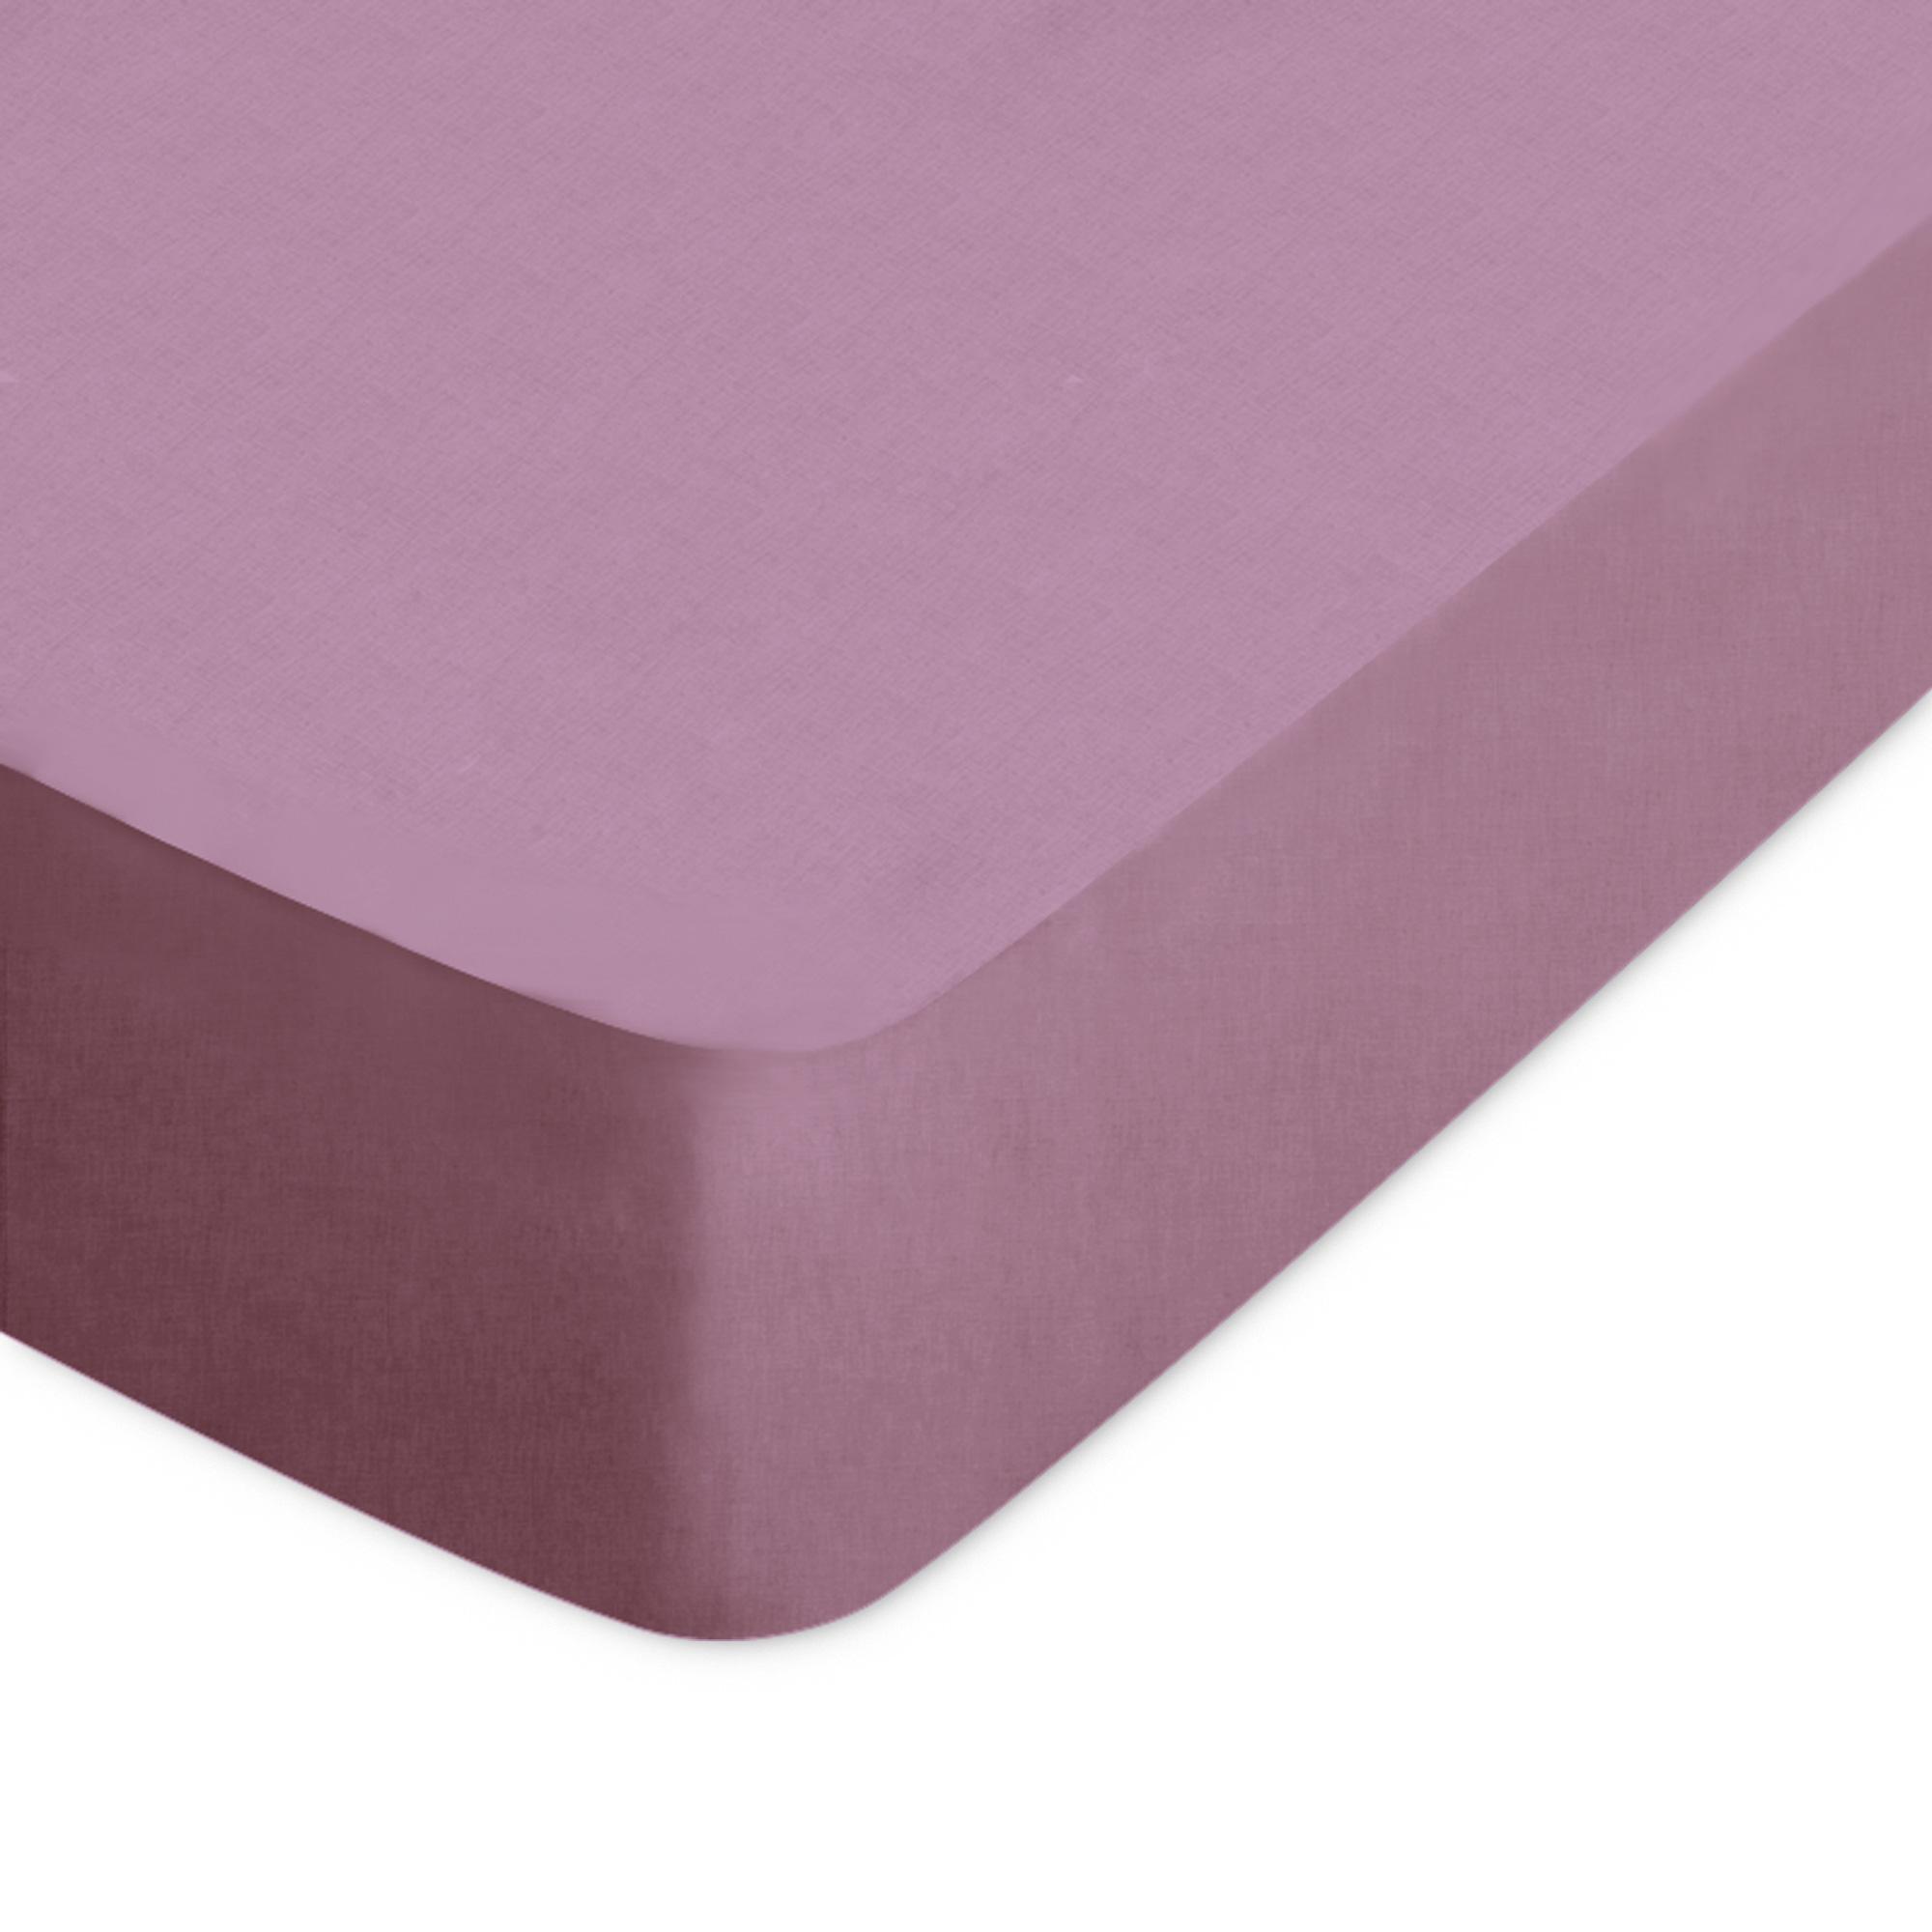 drap housse 100x200. Black Bedroom Furniture Sets. Home Design Ideas